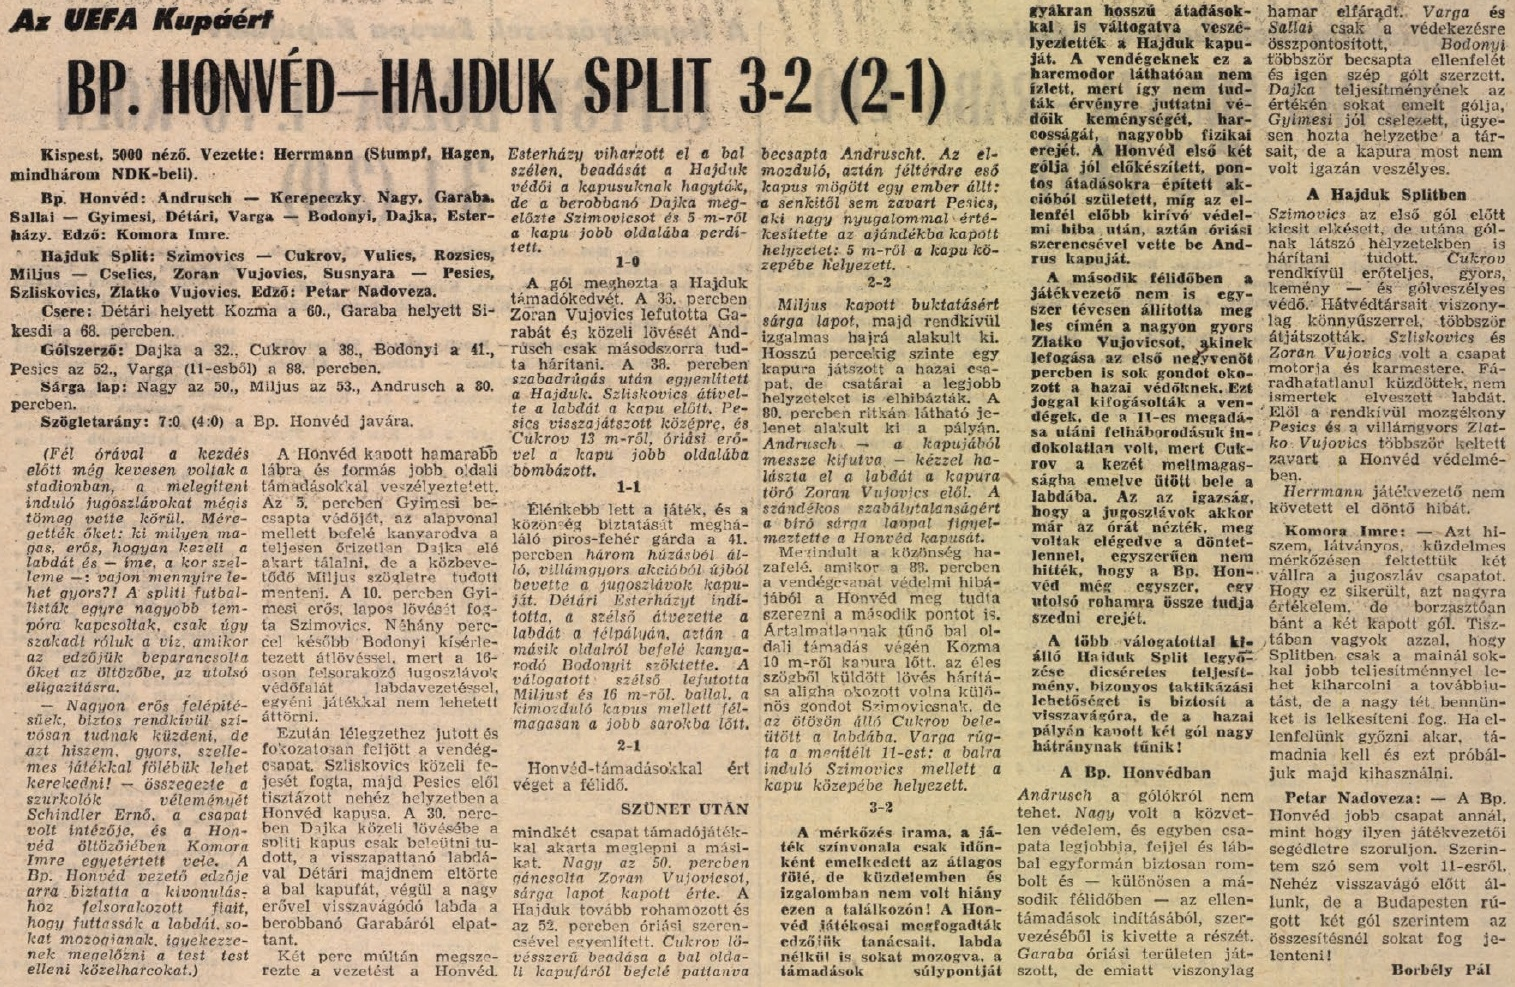 idokapszula_nb_i_1983_84_klubcsapataink_nemzetkozi_kupaszereplese_2_fordulo_1_kor_bp_honved_hajduk_split.jpg